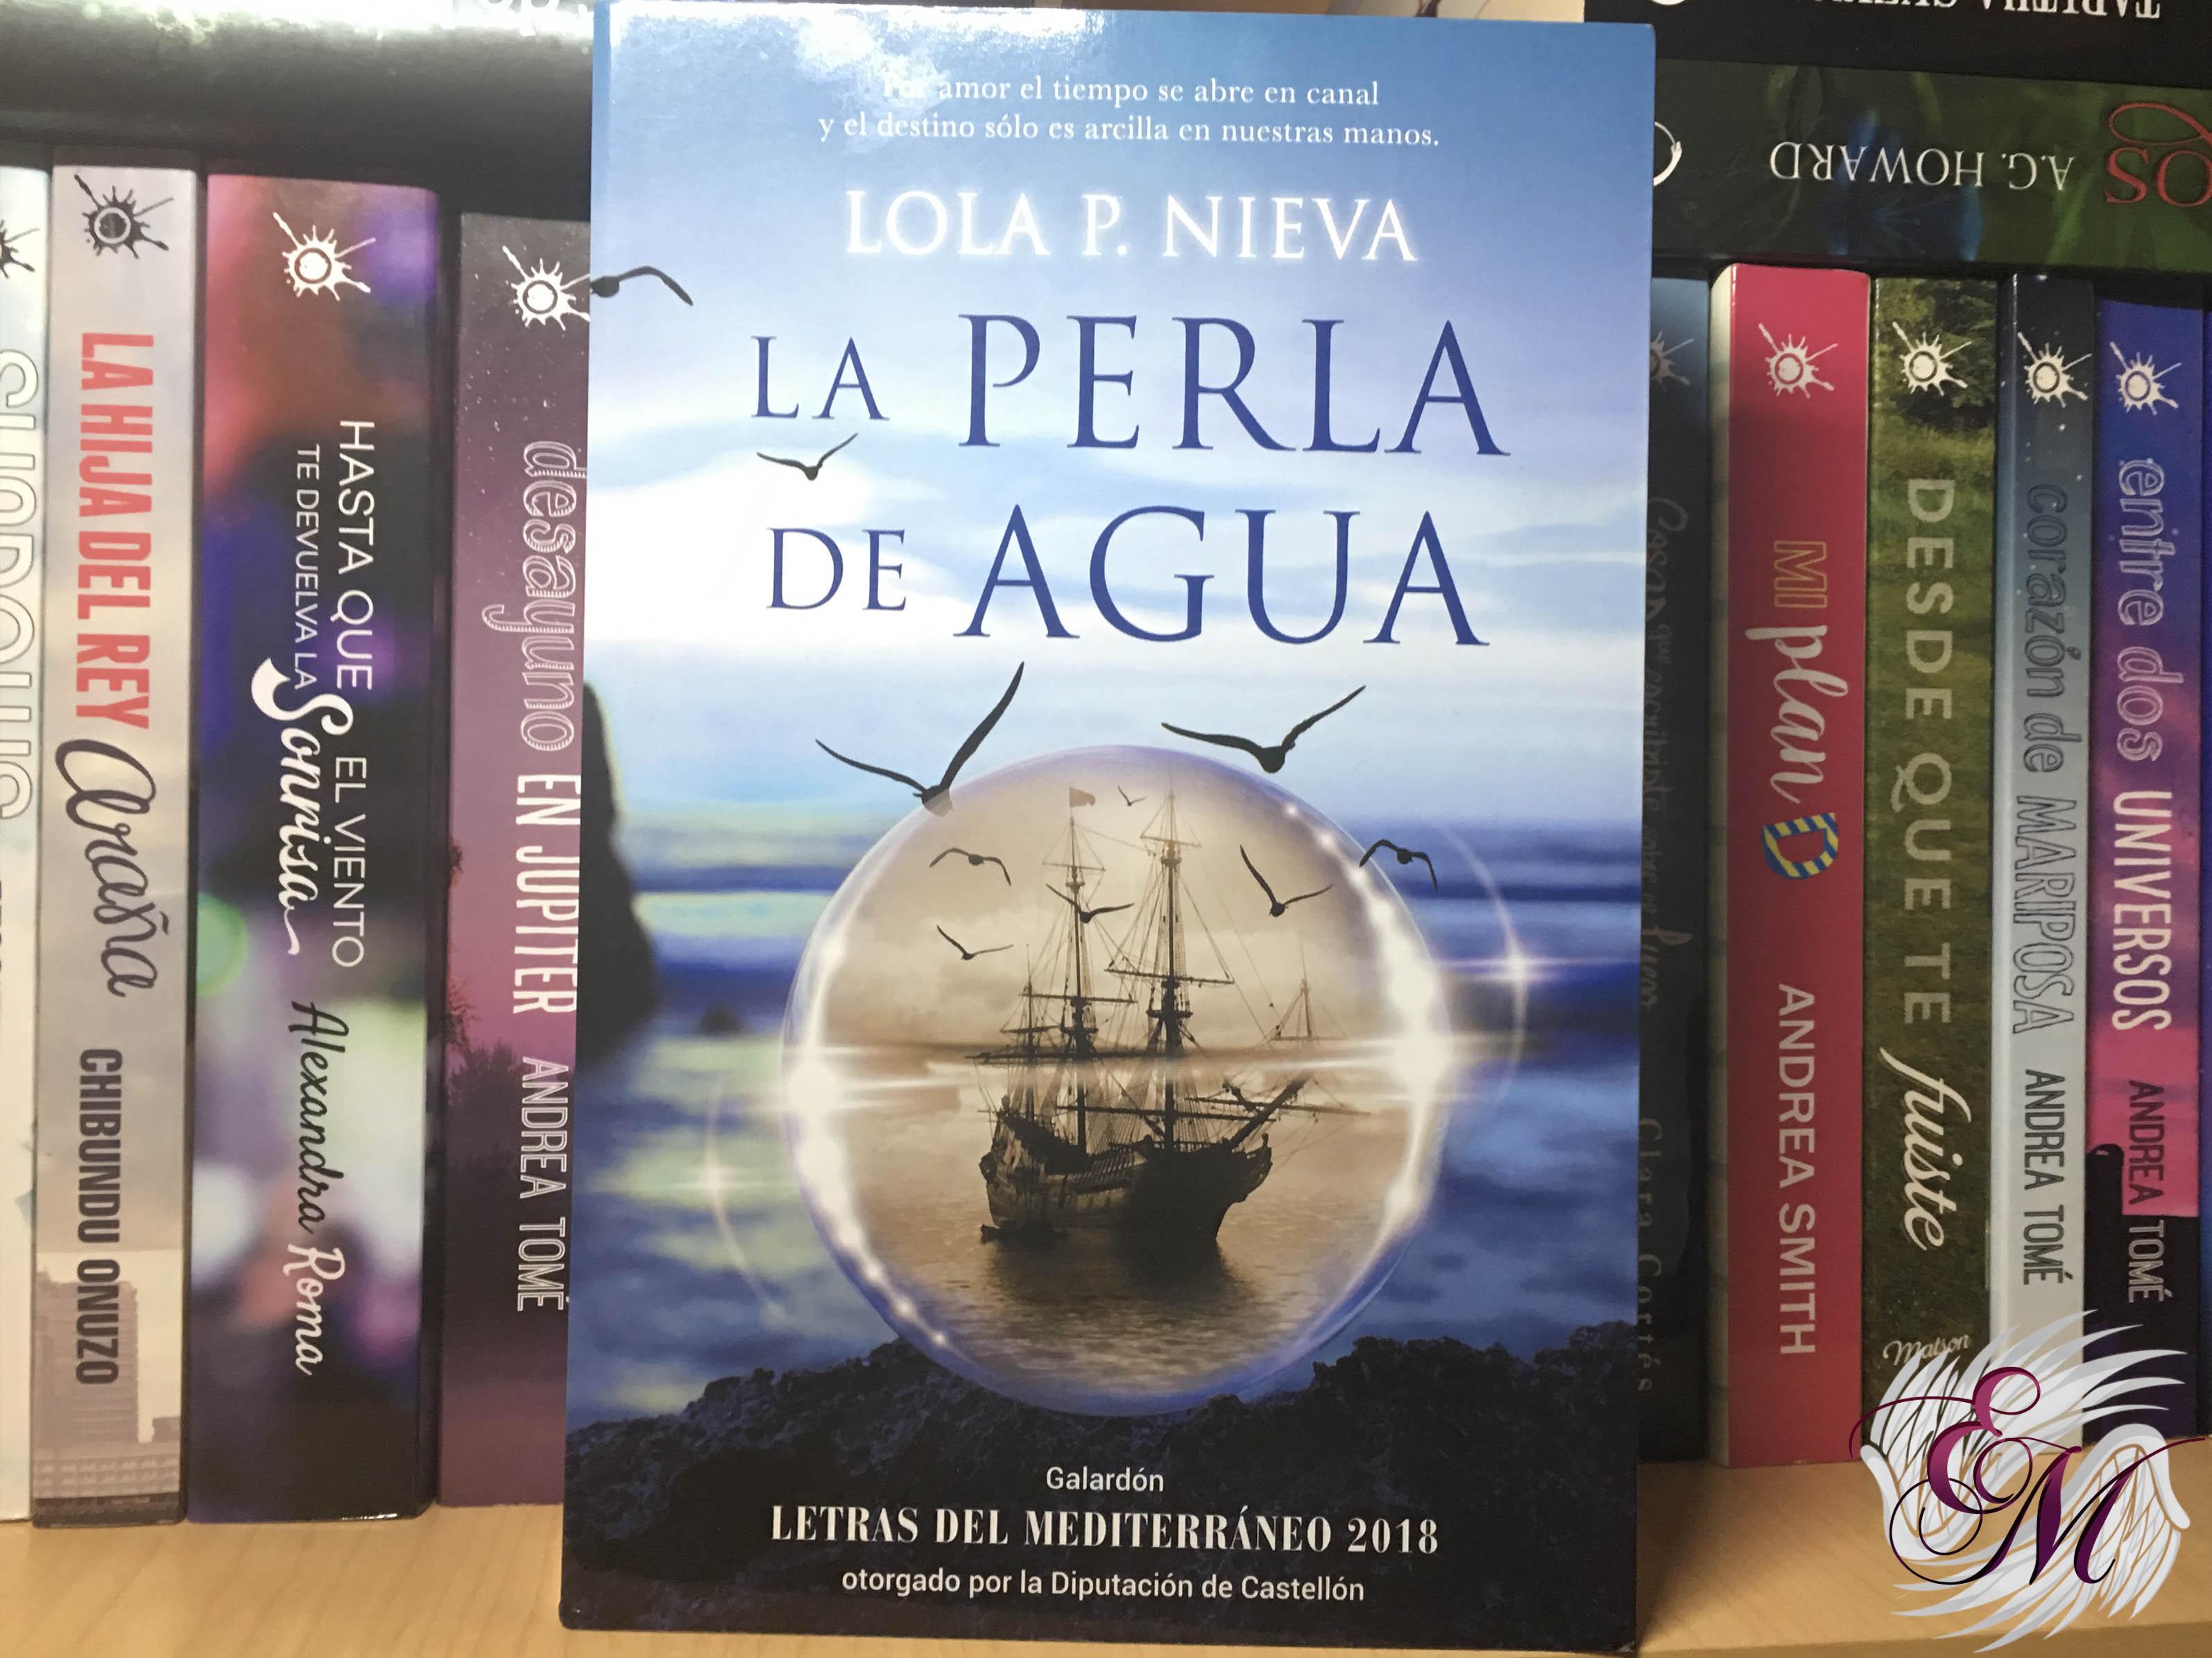 La perla de agua, de Lola P Nieva - Reseña